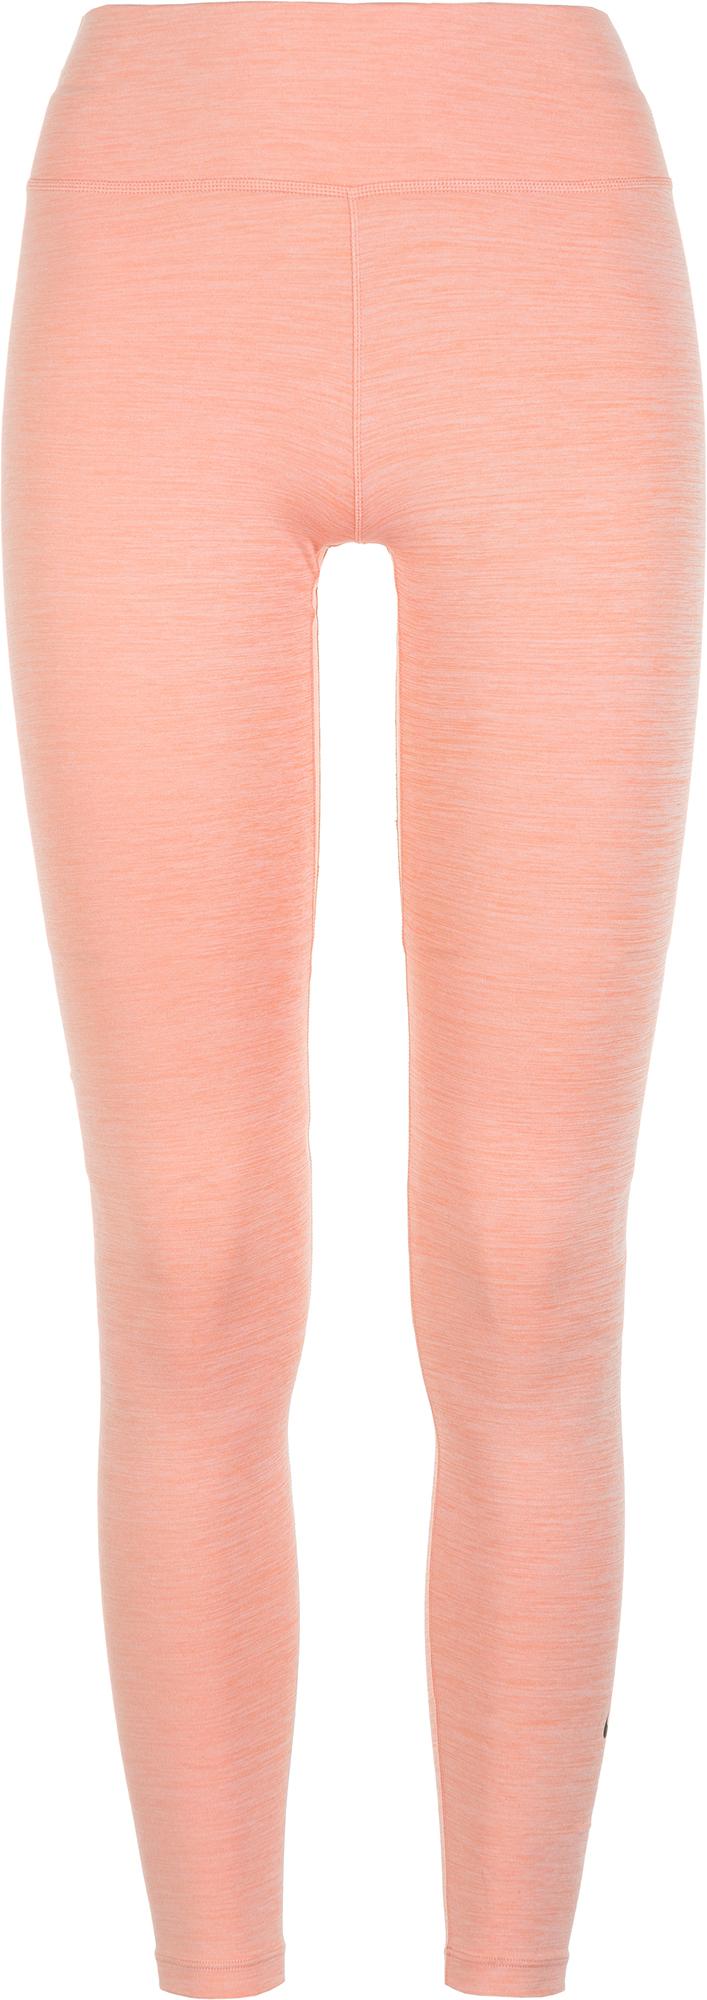 Nike Легинсы женские Nike All-In, размер 46-48 леггинсы женские nike sportswear leggings цвет серый 883657 036 размер m 46 48